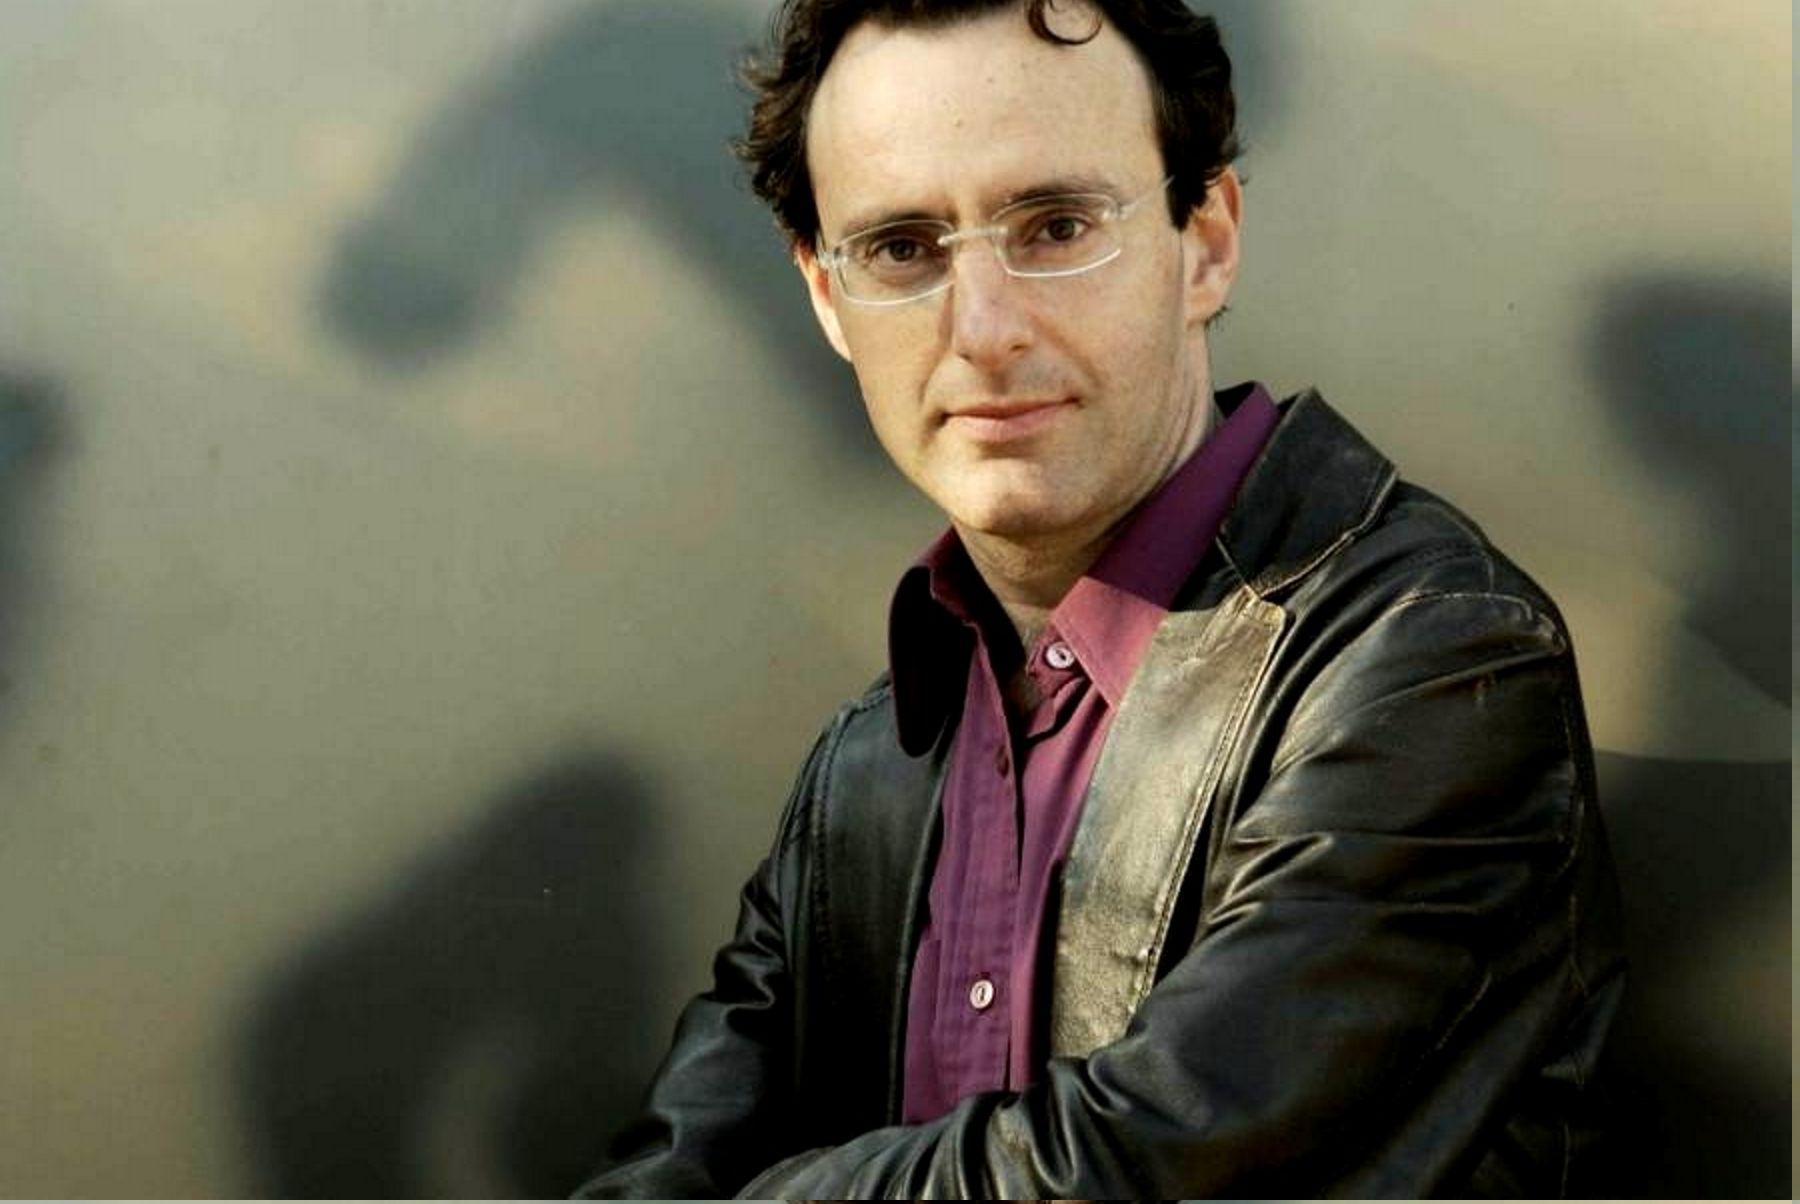 Marco Tonelli